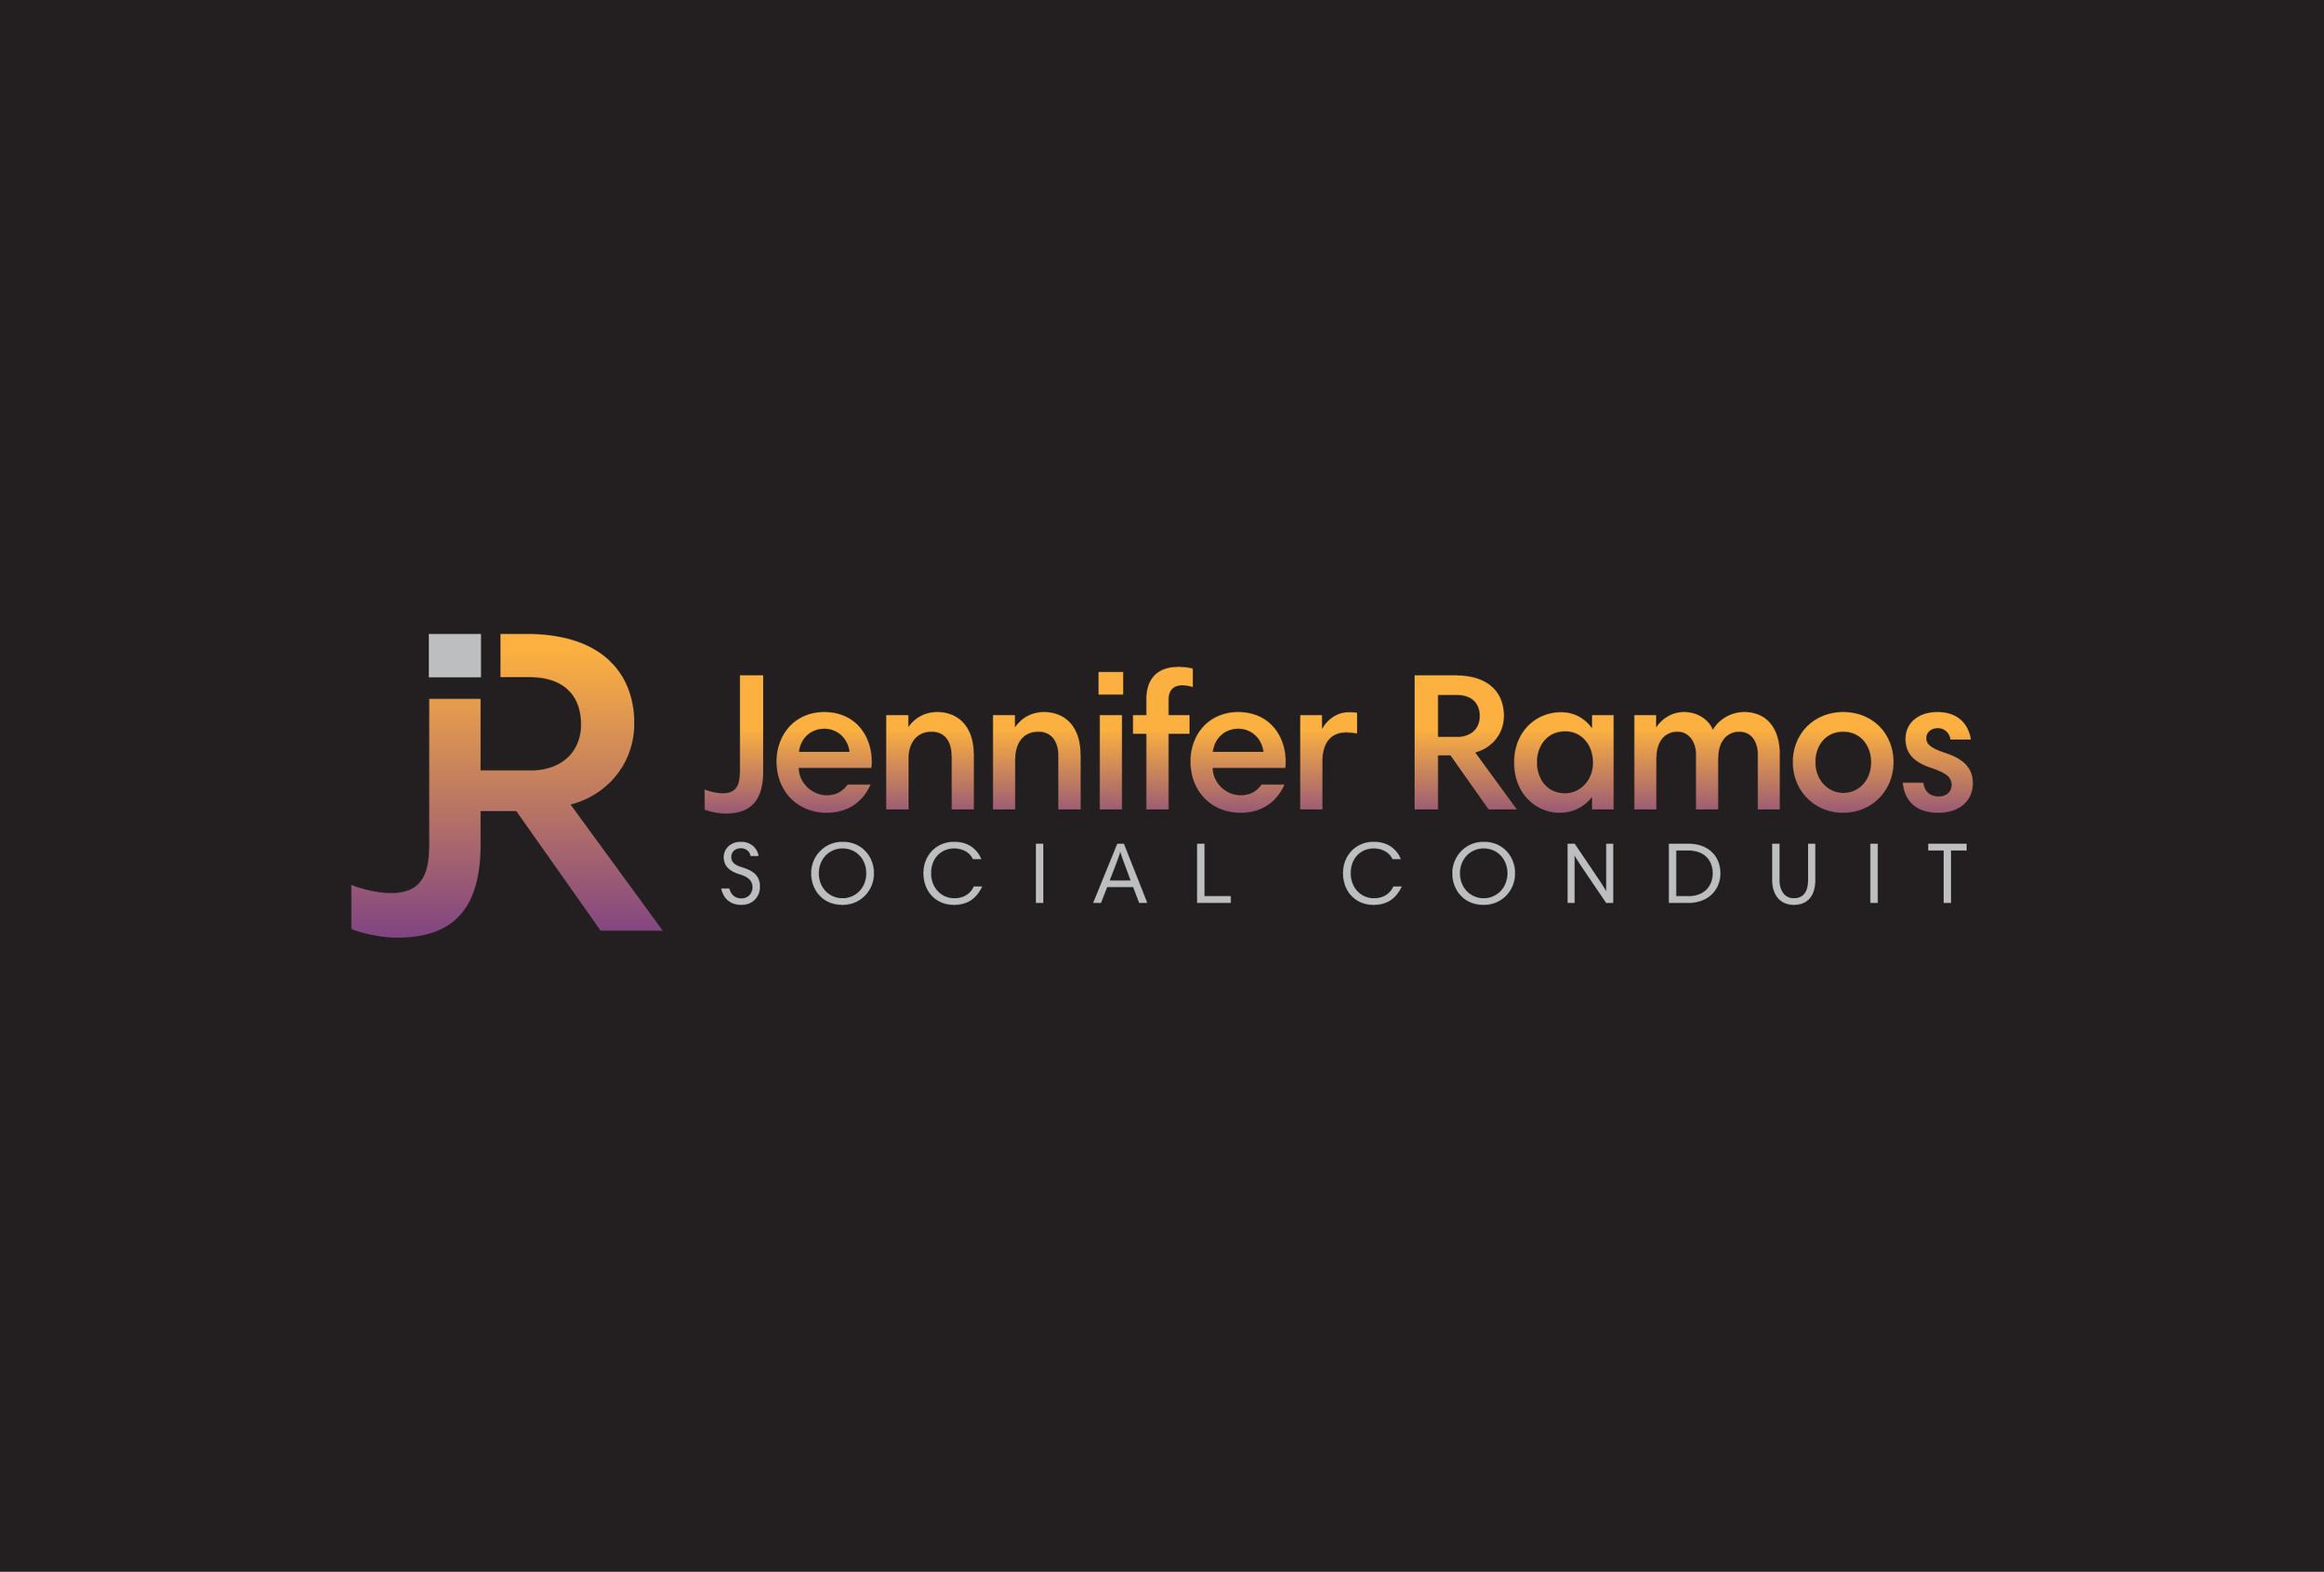 Jennifer_Ramos_LOGOonBlack.jpg